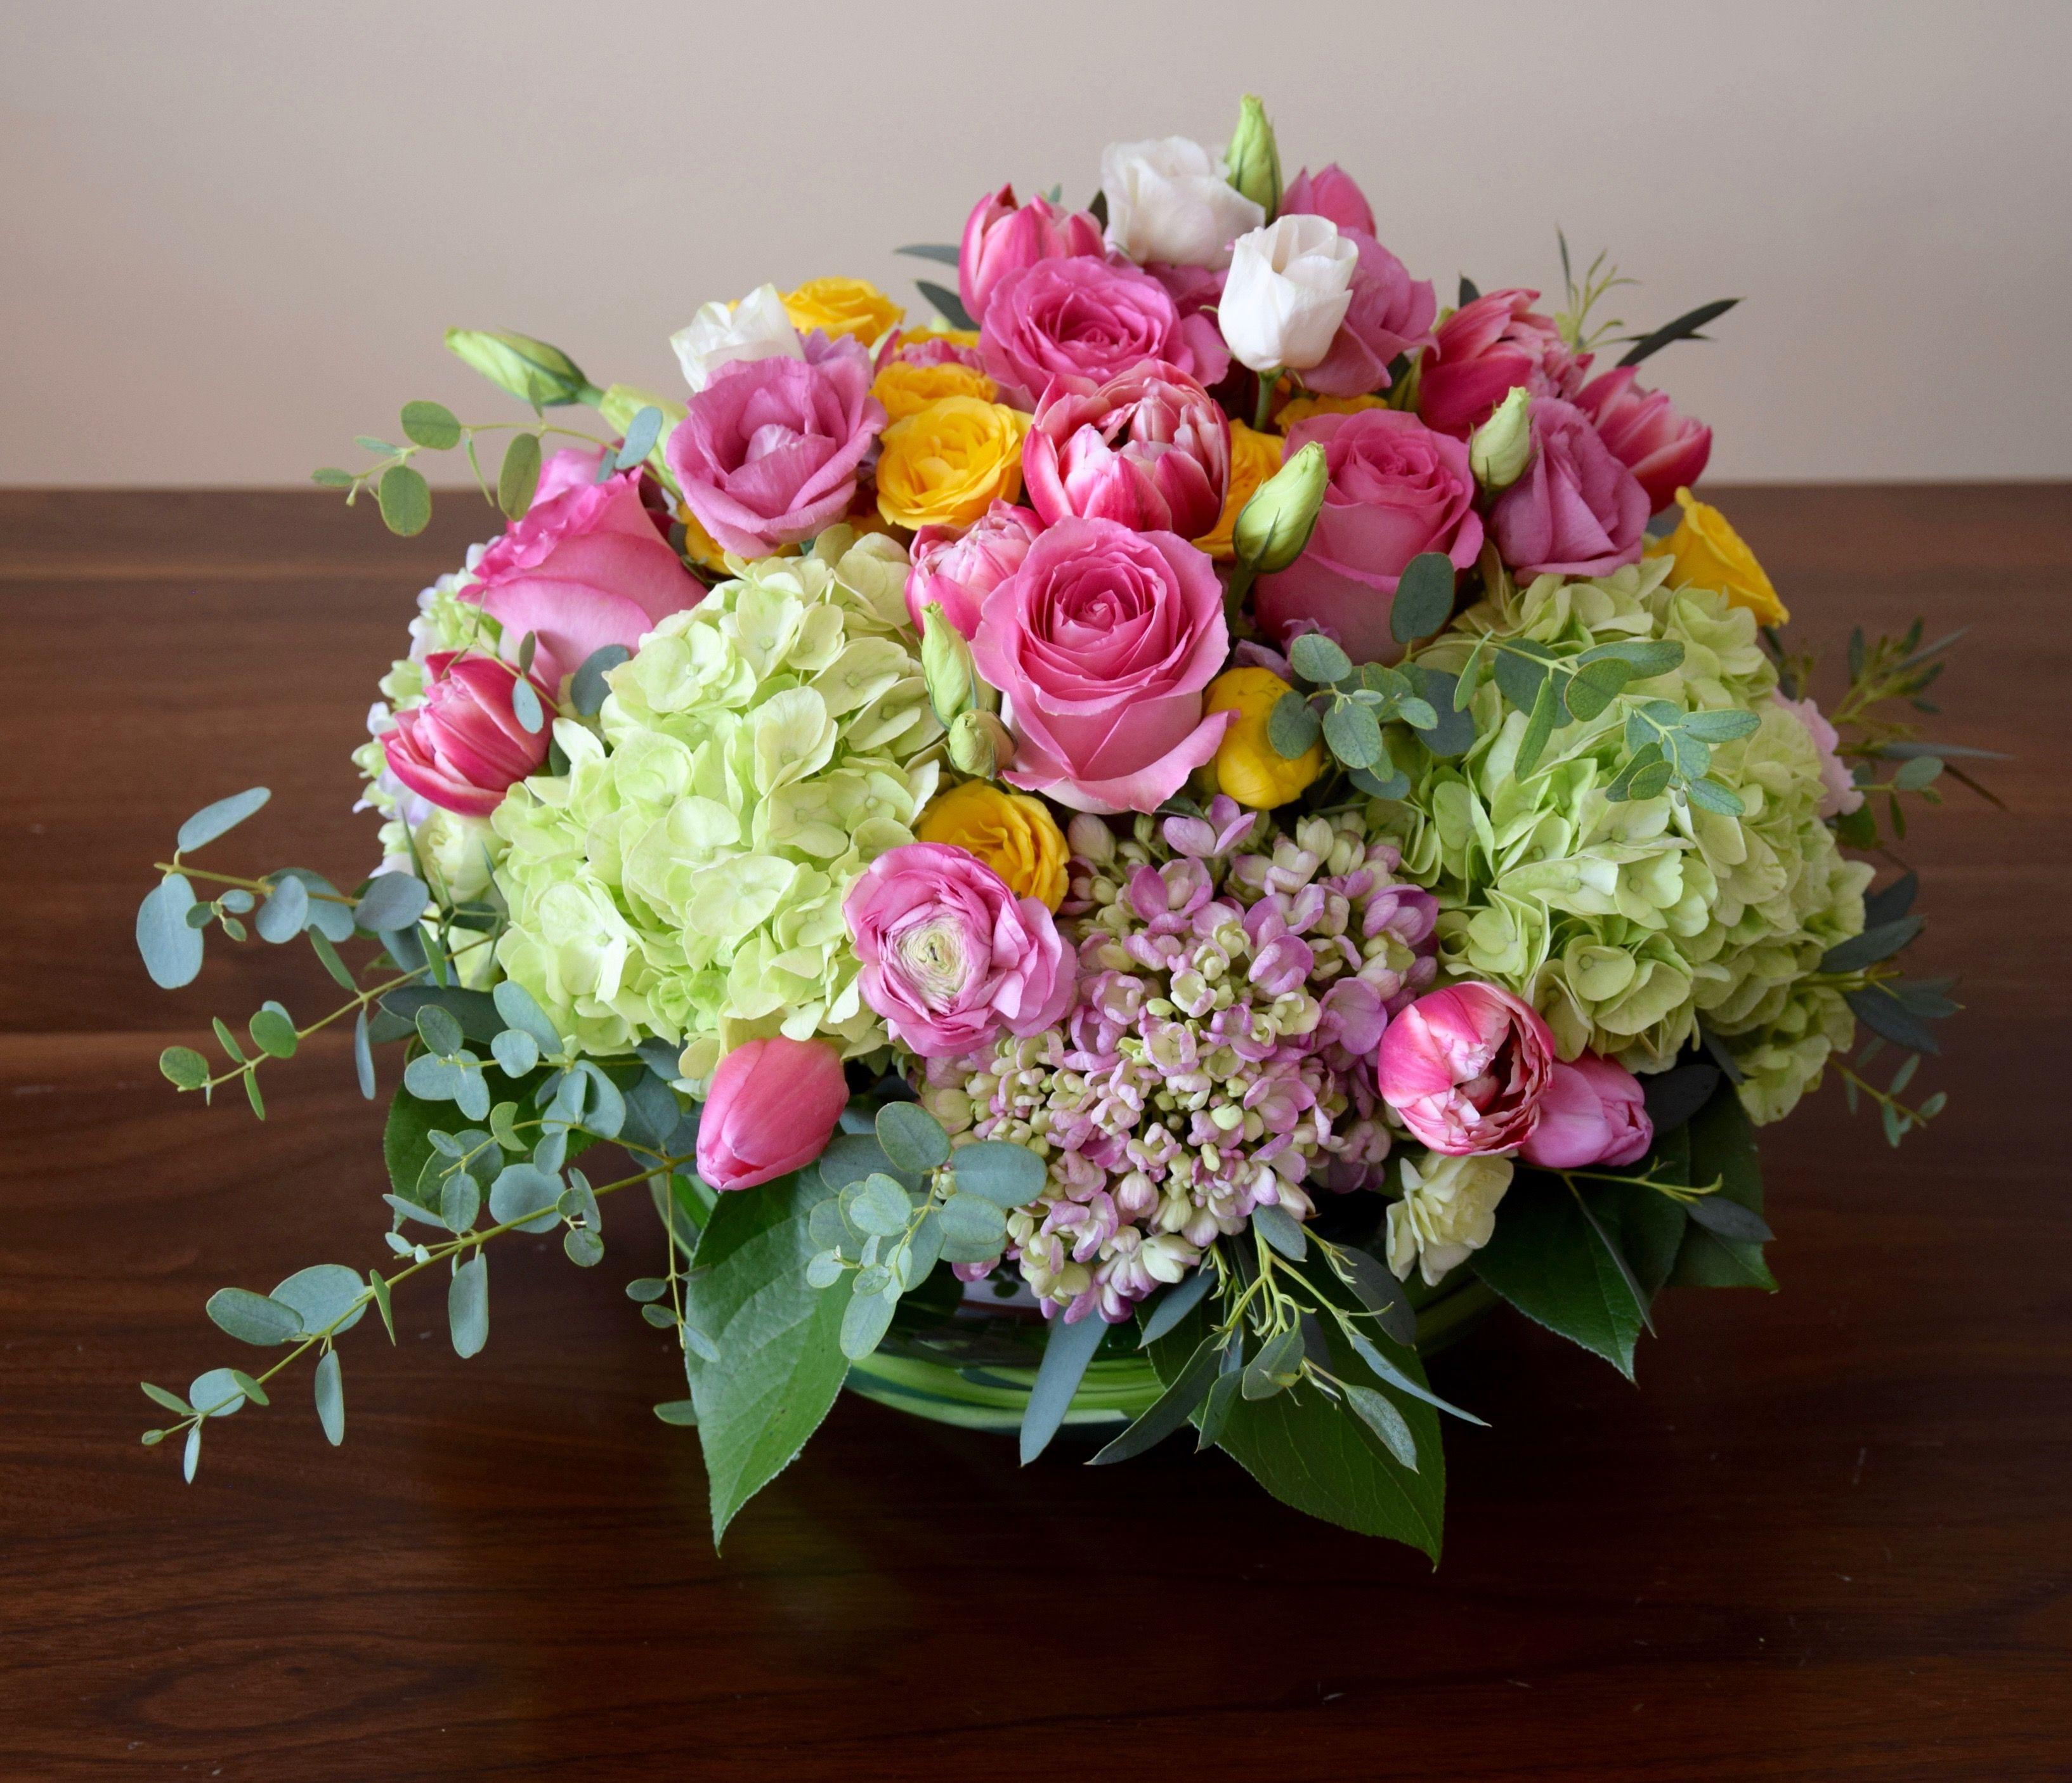 Birthday flower arrangement with pinks yellows greens